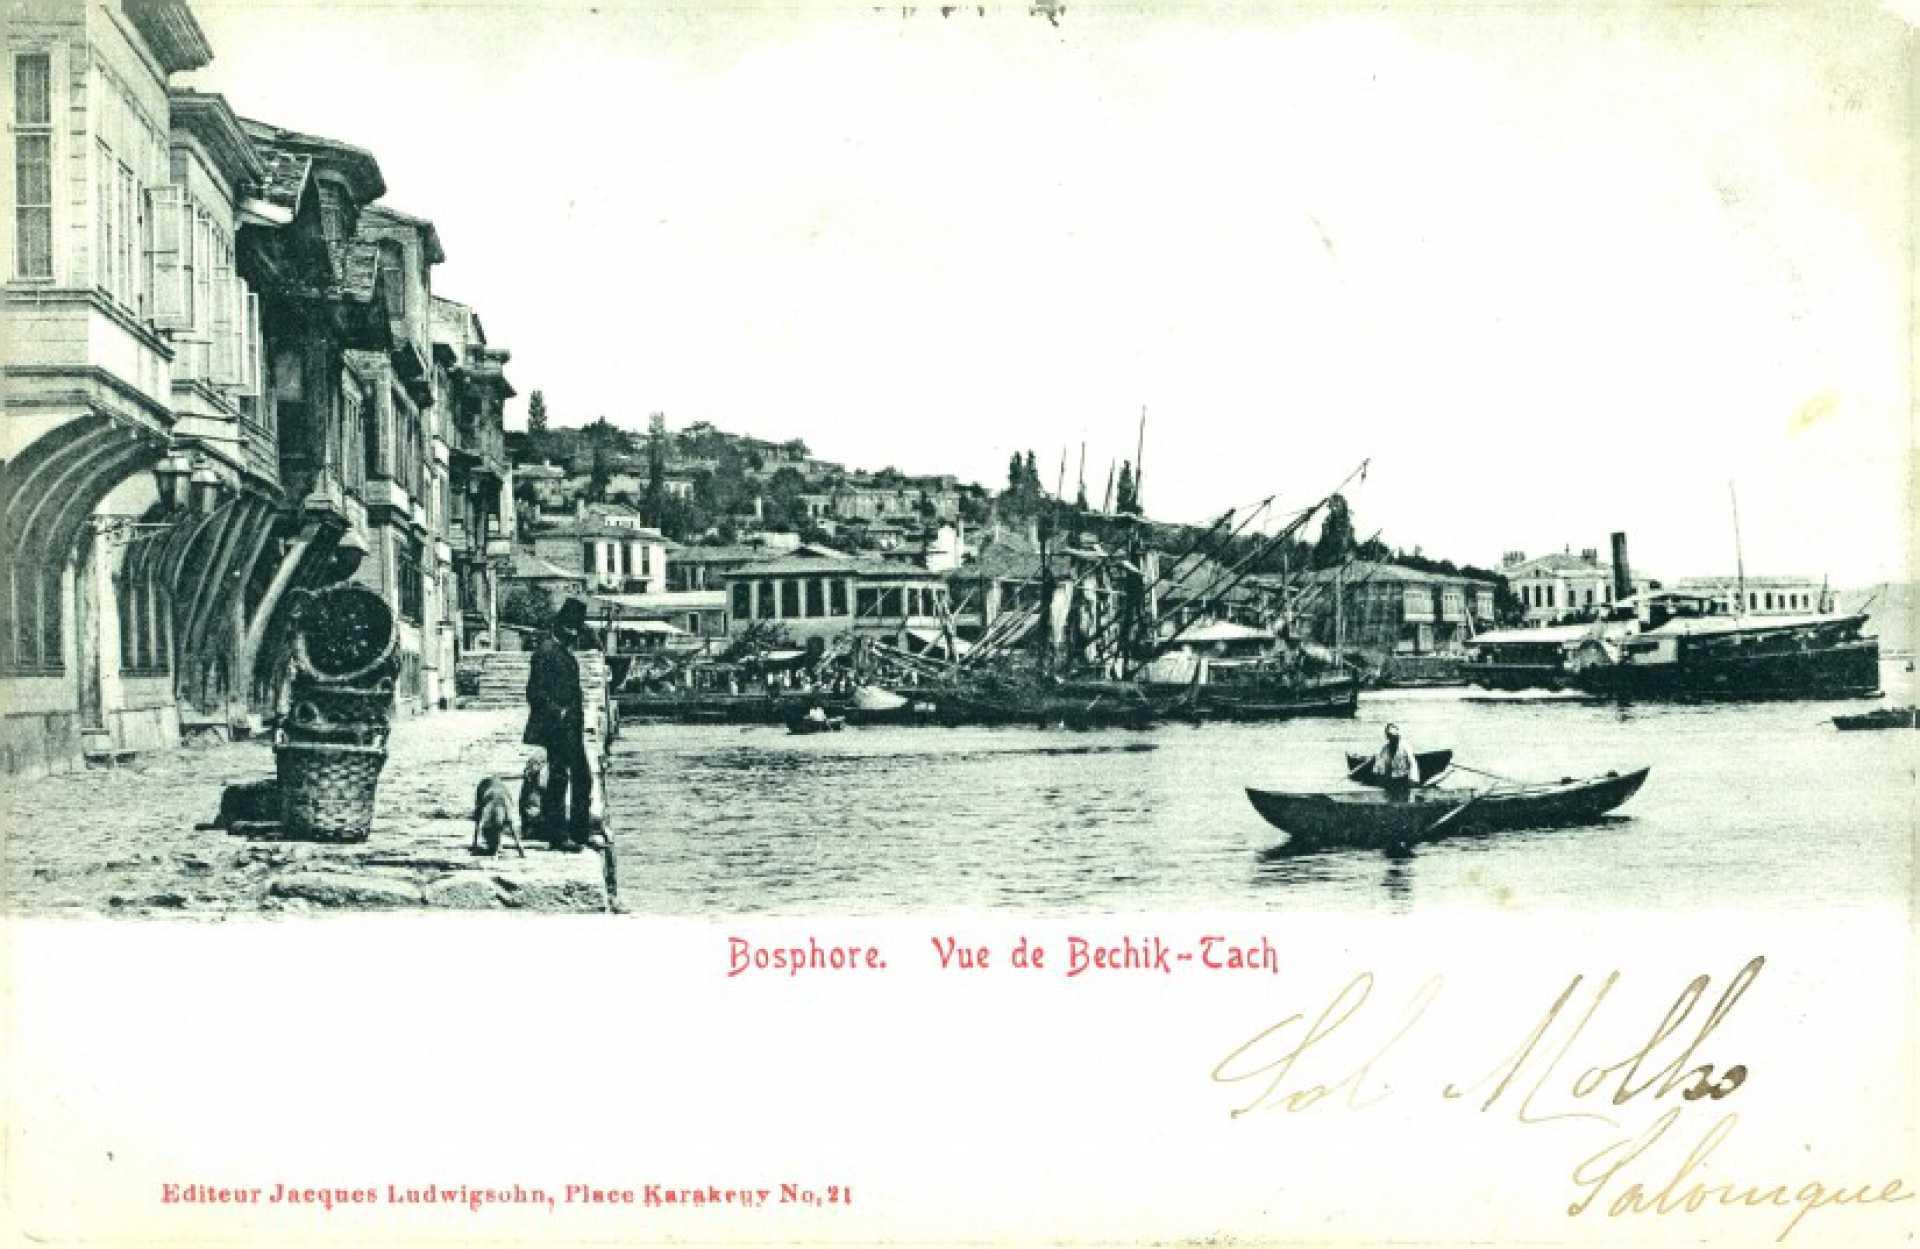 Bosphore. Vue de Bechik-Tach